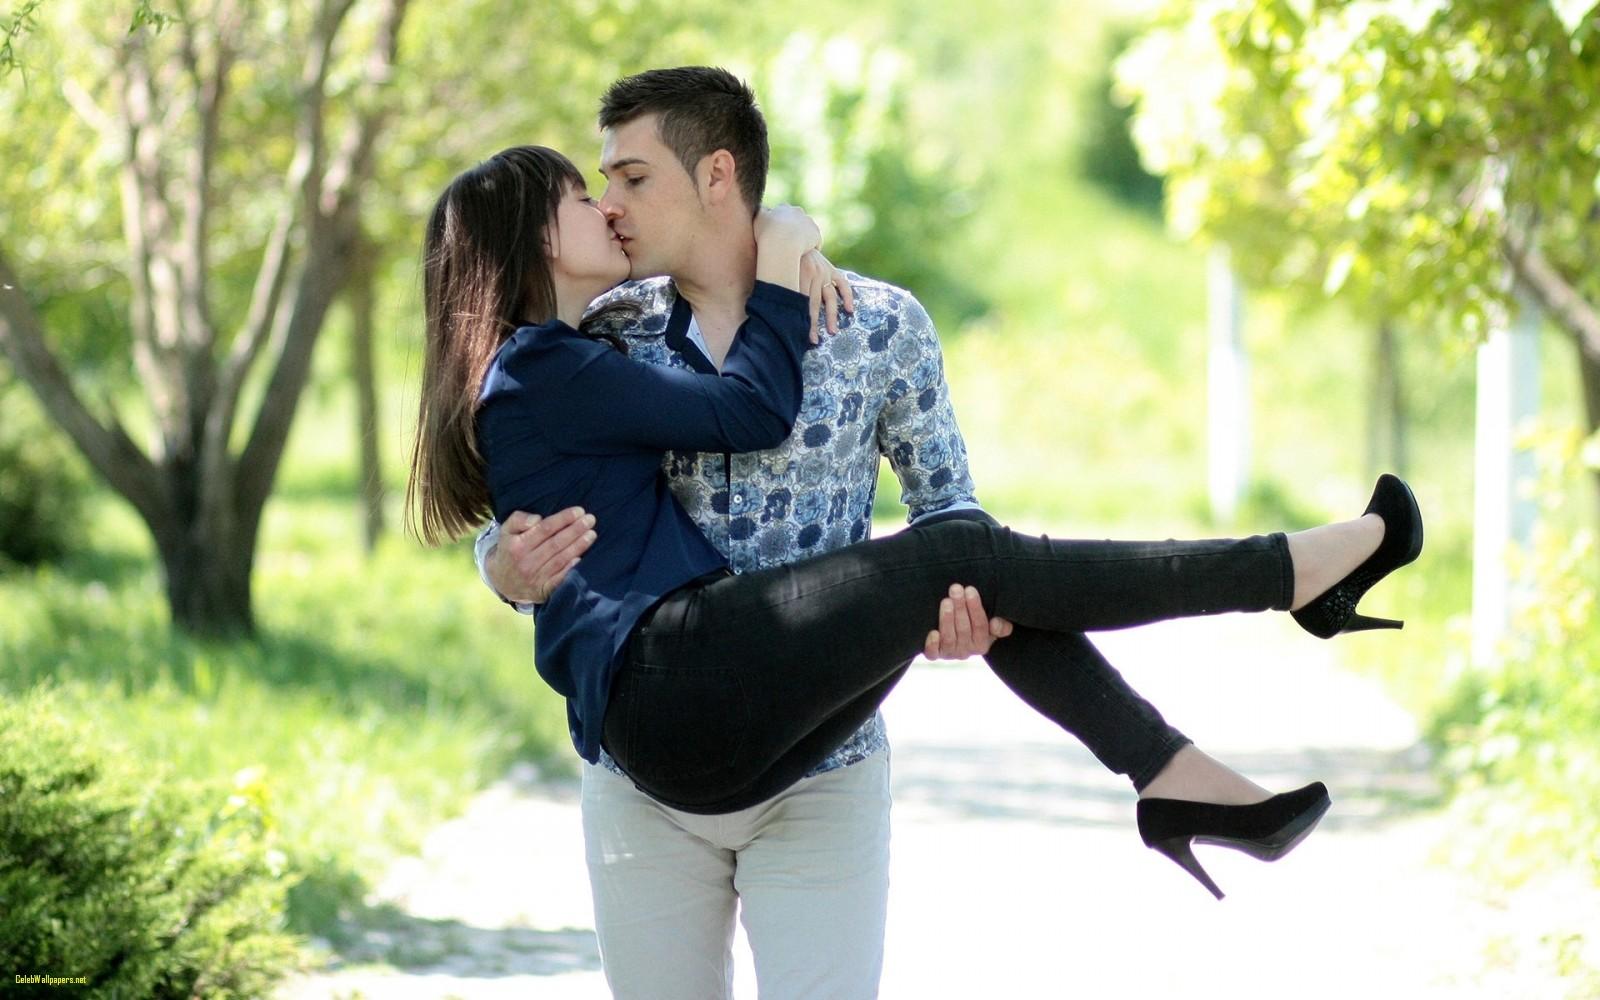 صورة صور حب رومنسي , اجمل صور حب رومنسى 690 7